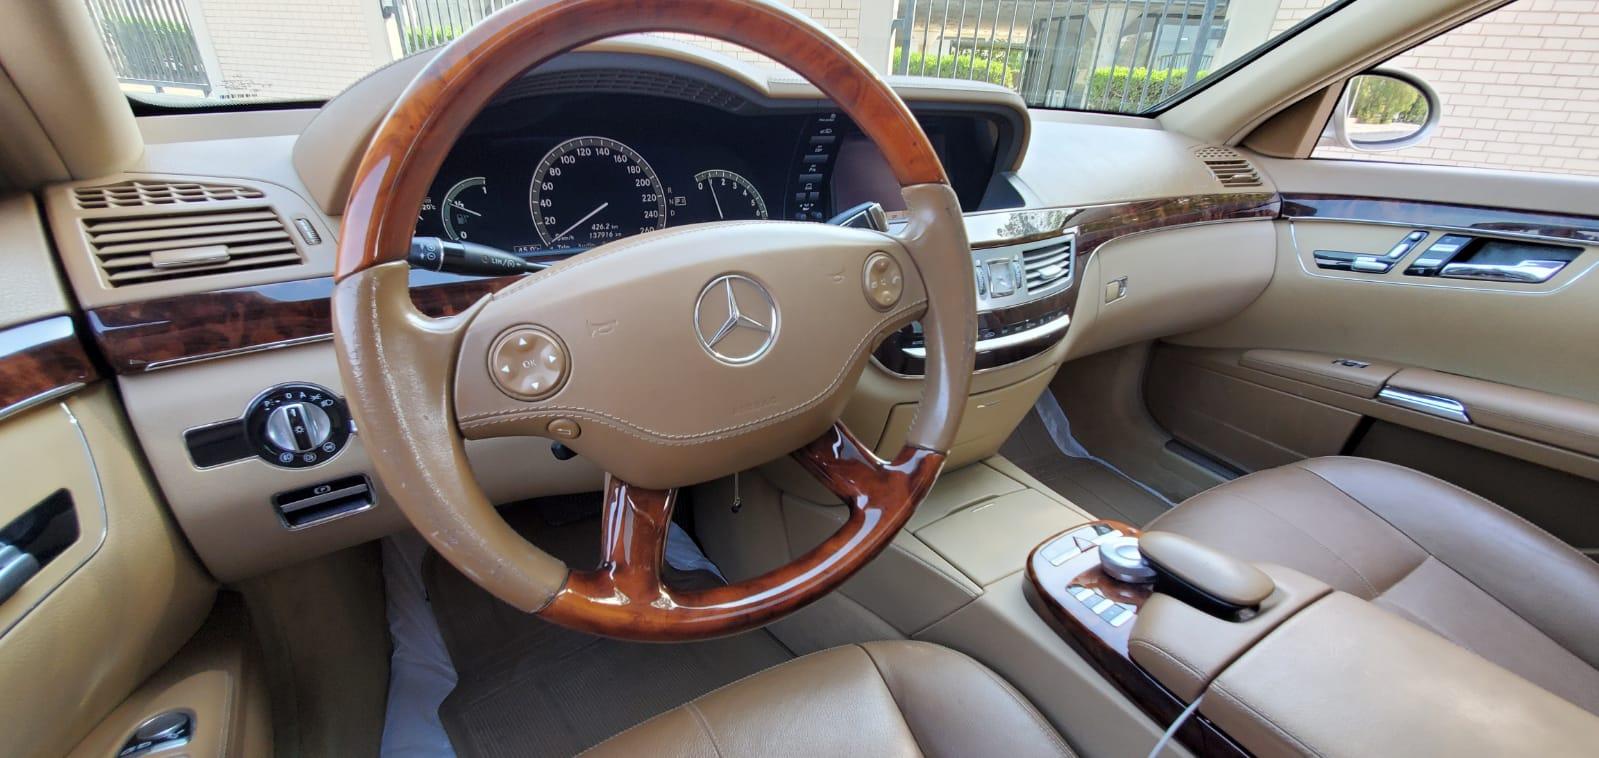 Mercedes-Benz S350 2007